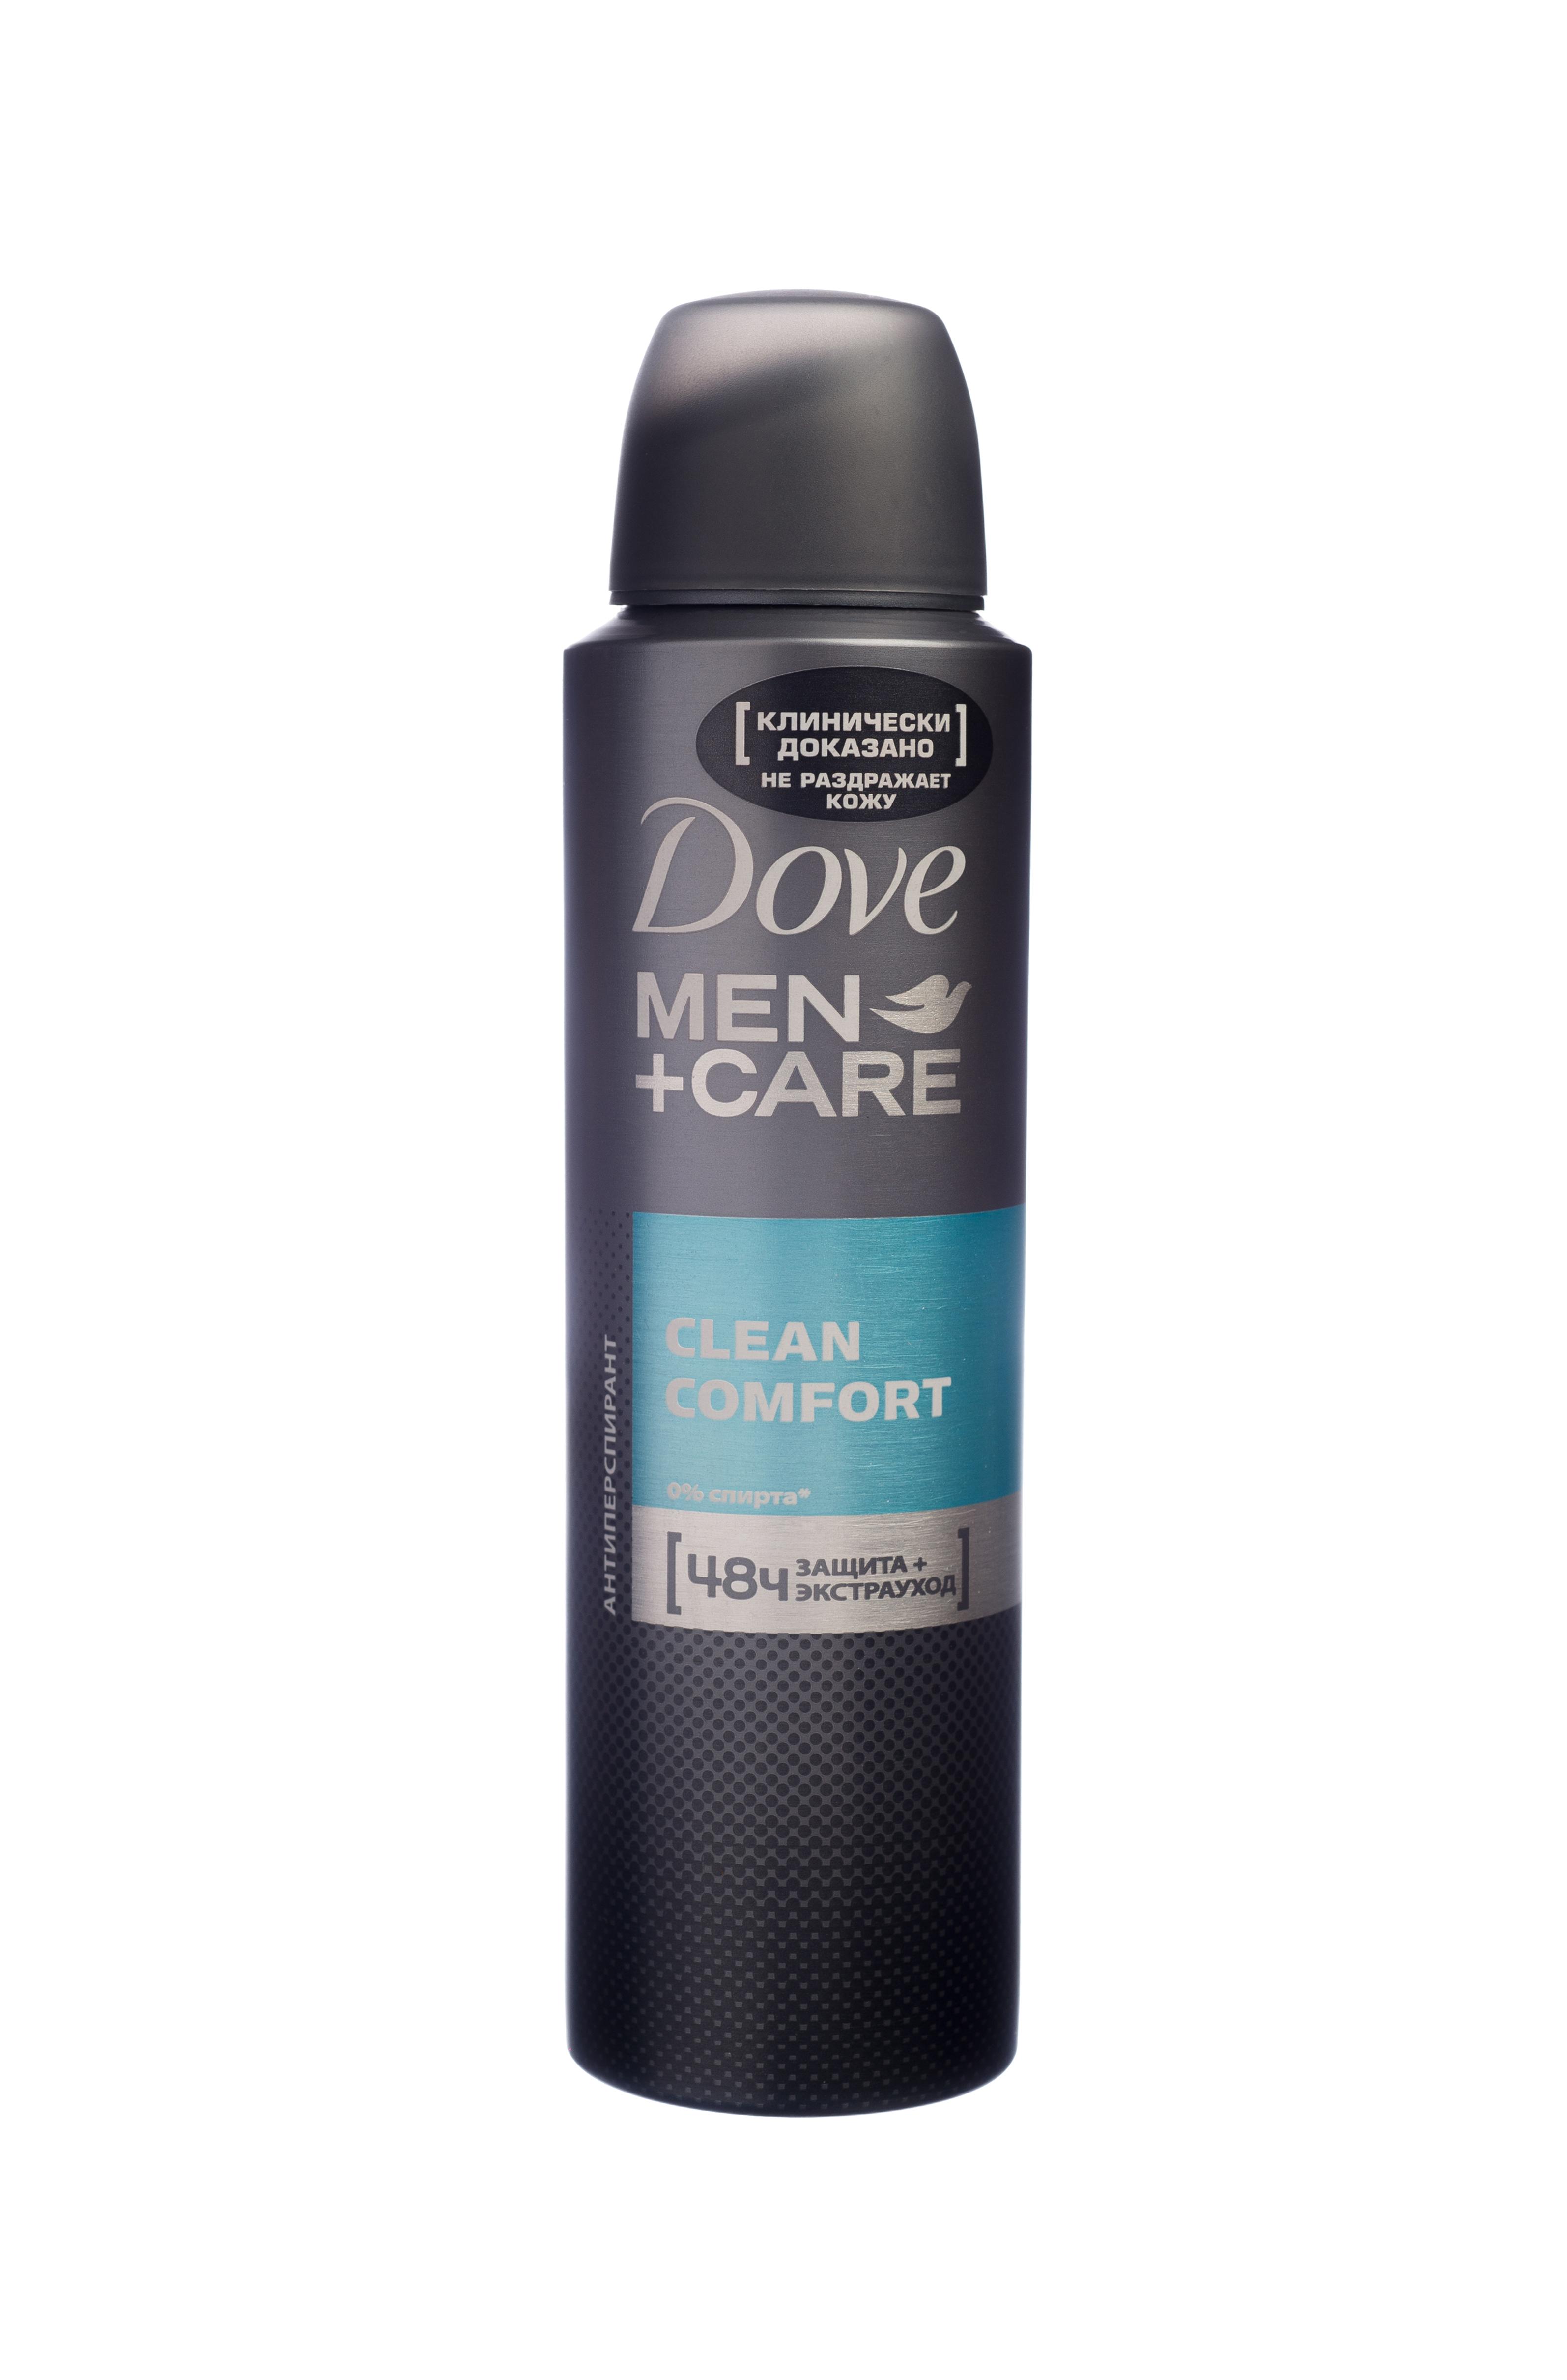 Dove Men+Care Антиперспирант аэрозоль Экстразащита и уход 150 мл 21132346